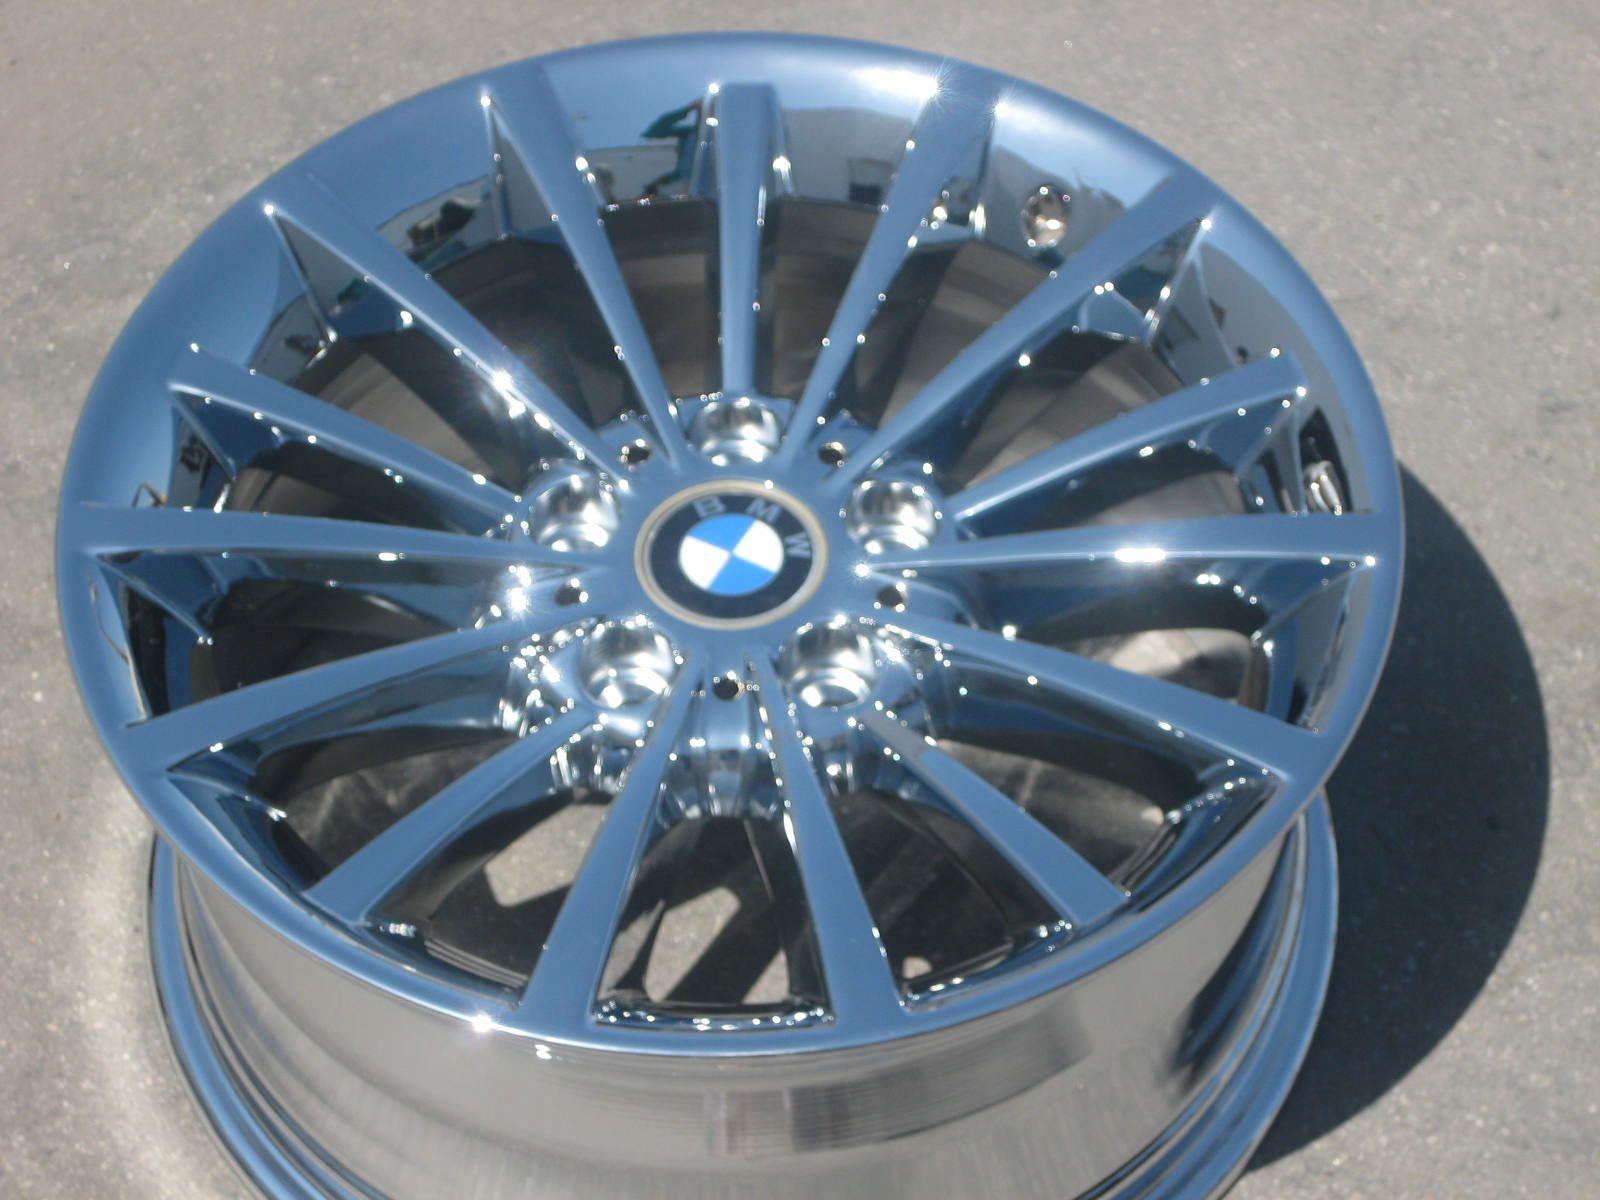 STOCK = 17 FACTORY BMW 323i 328i 335i 528xi 535xi CHROME WHEELS RIMS